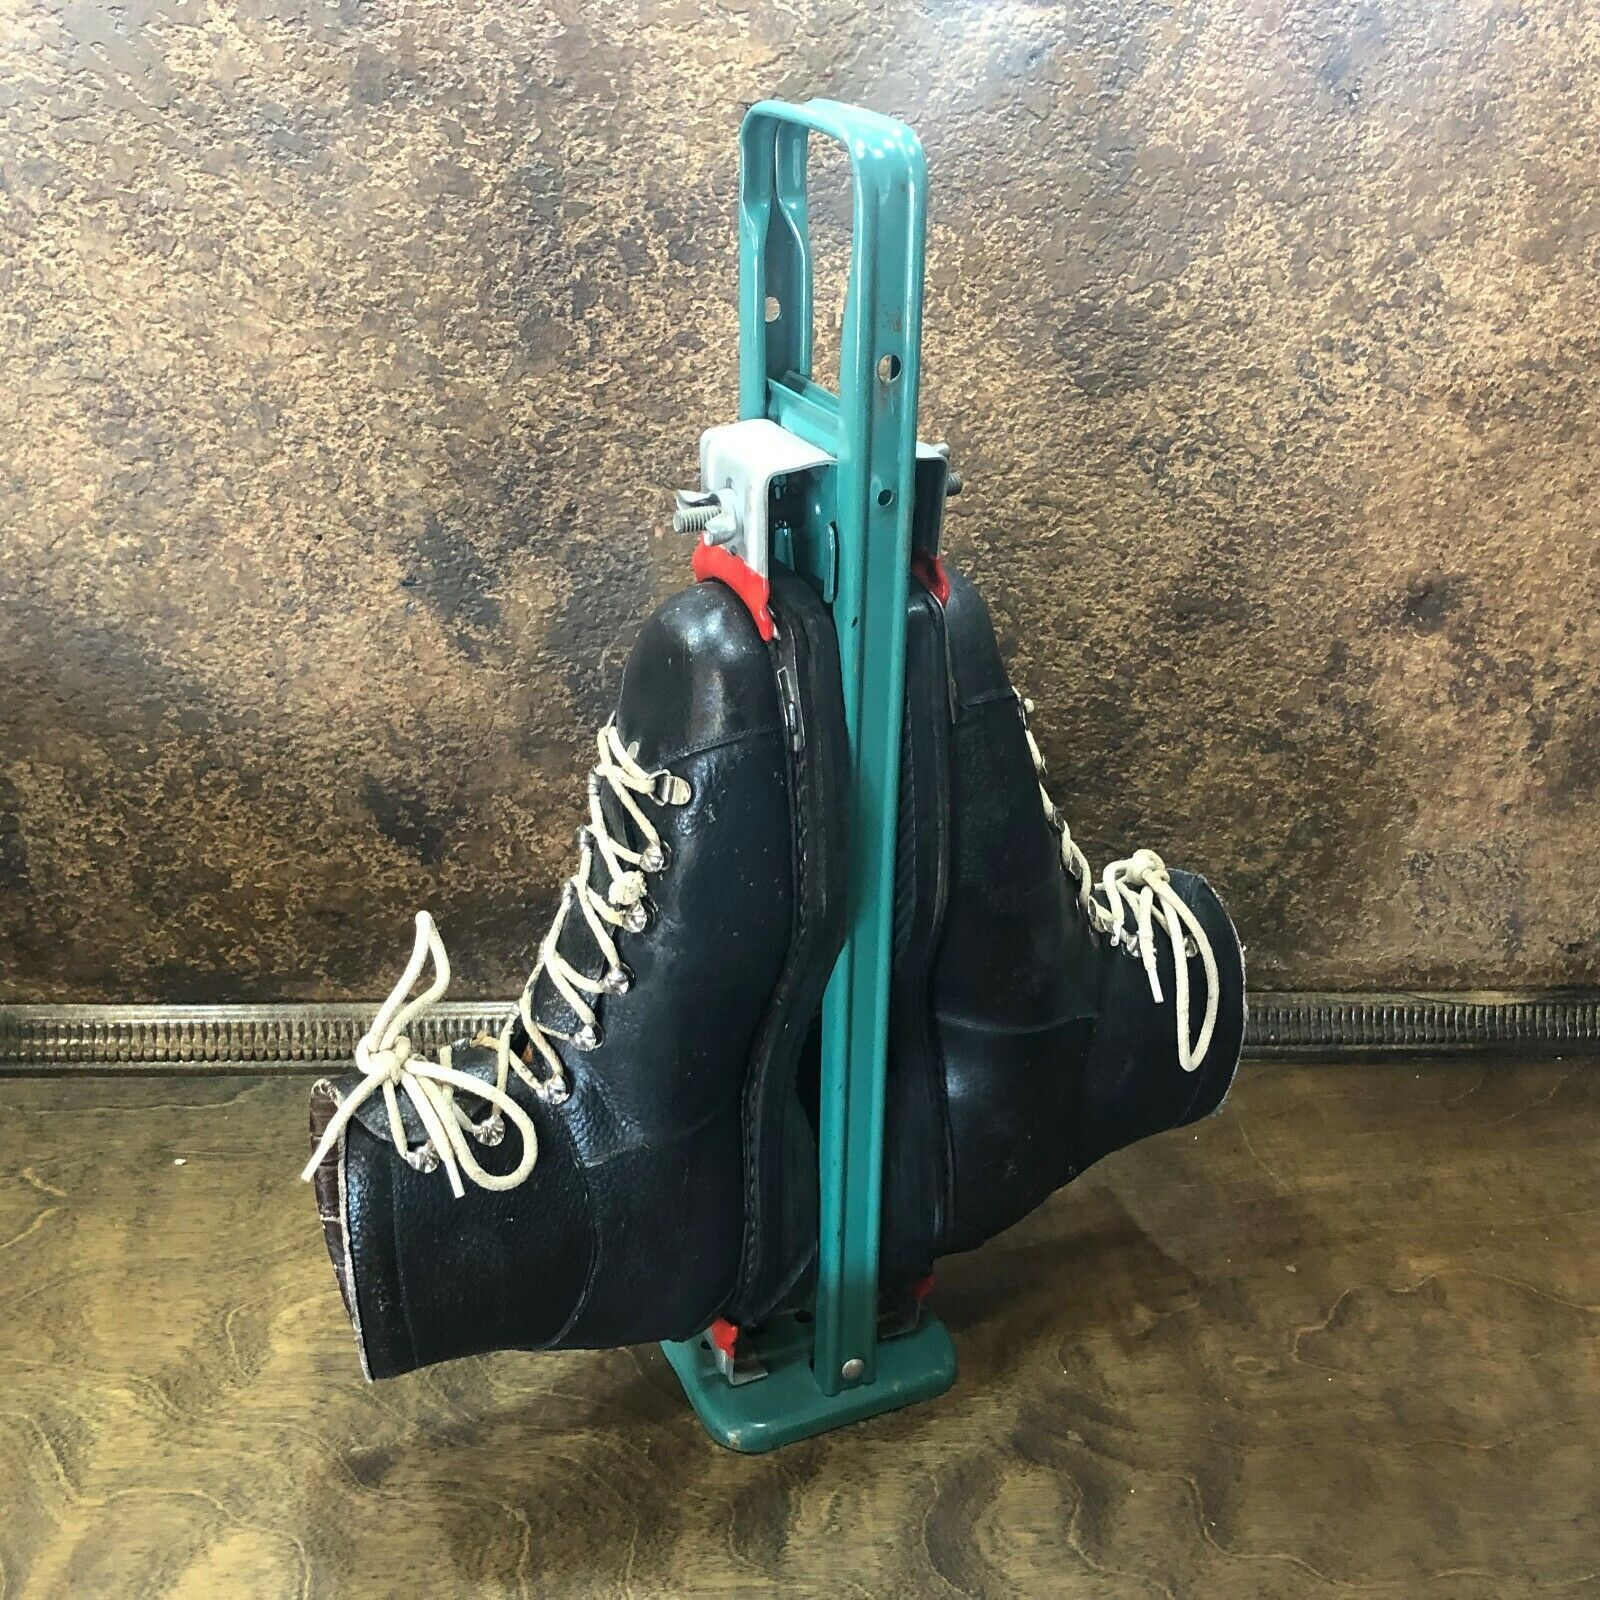 Vintage Leather Ski Boots w Hanger Carrier  Antigue Cabin Lake Ski Lodge Decor